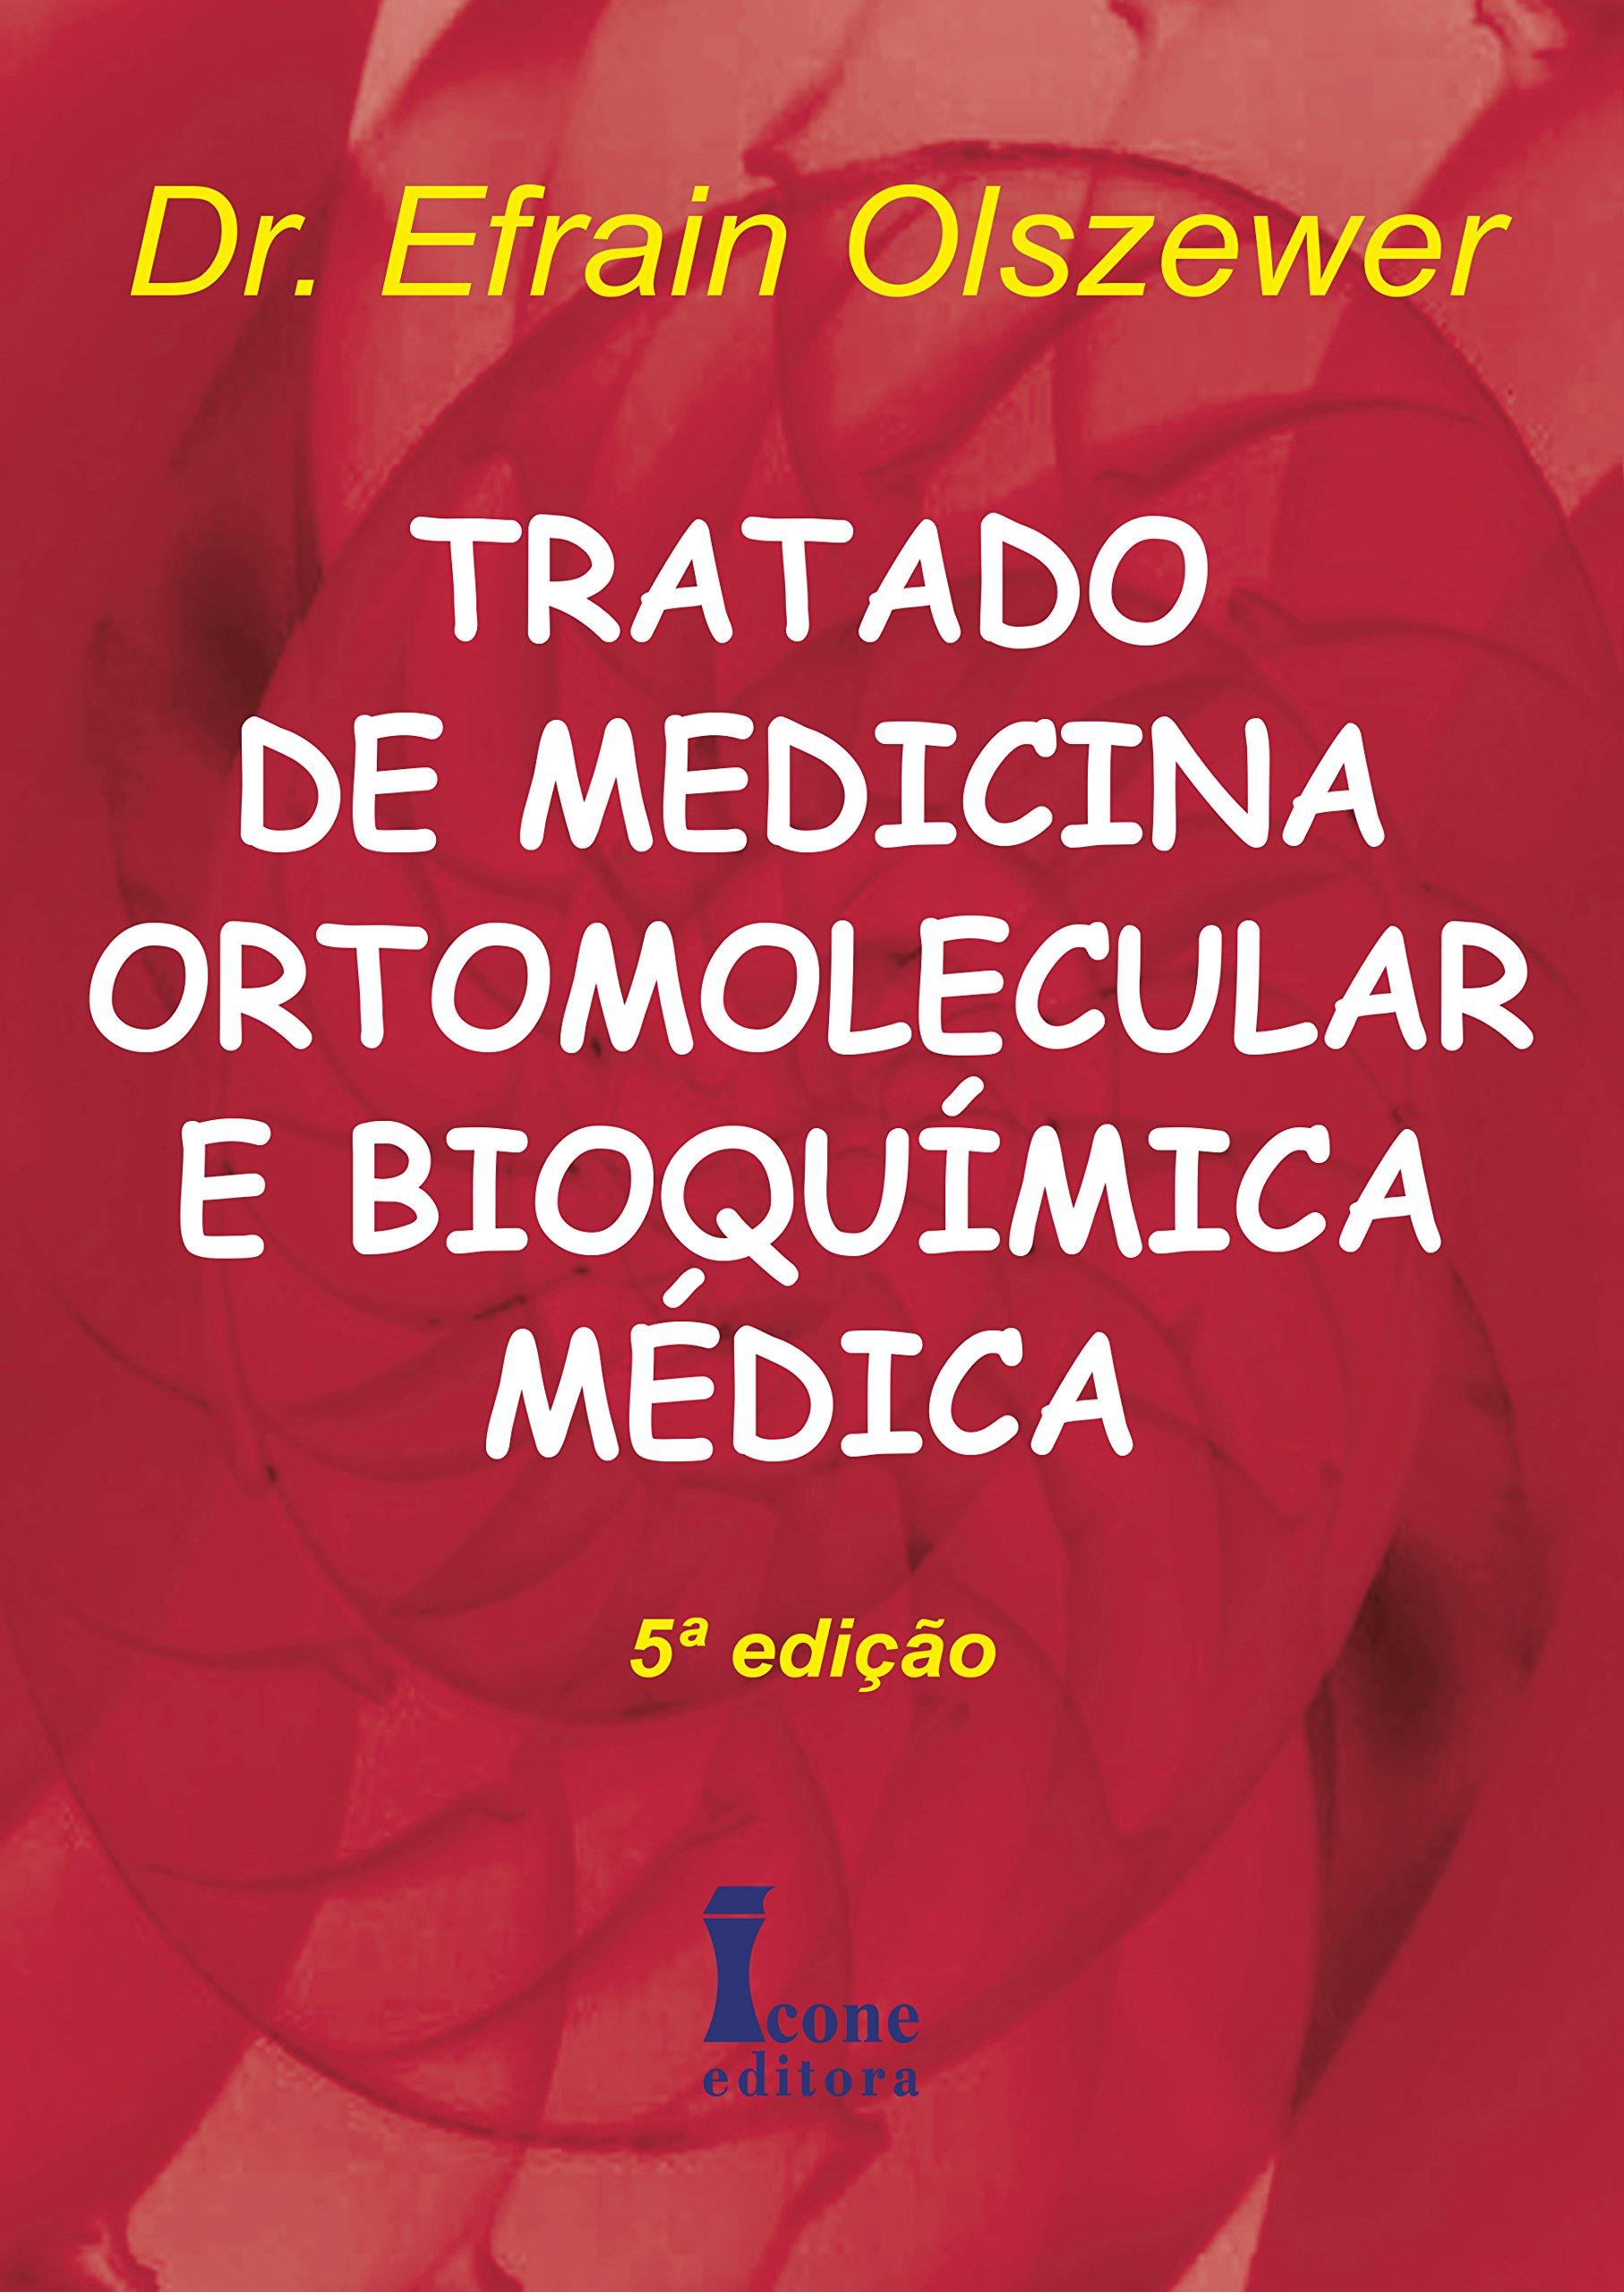 Tratado De Medicina Ortomolecular E Bioquimica Medica (Em ...